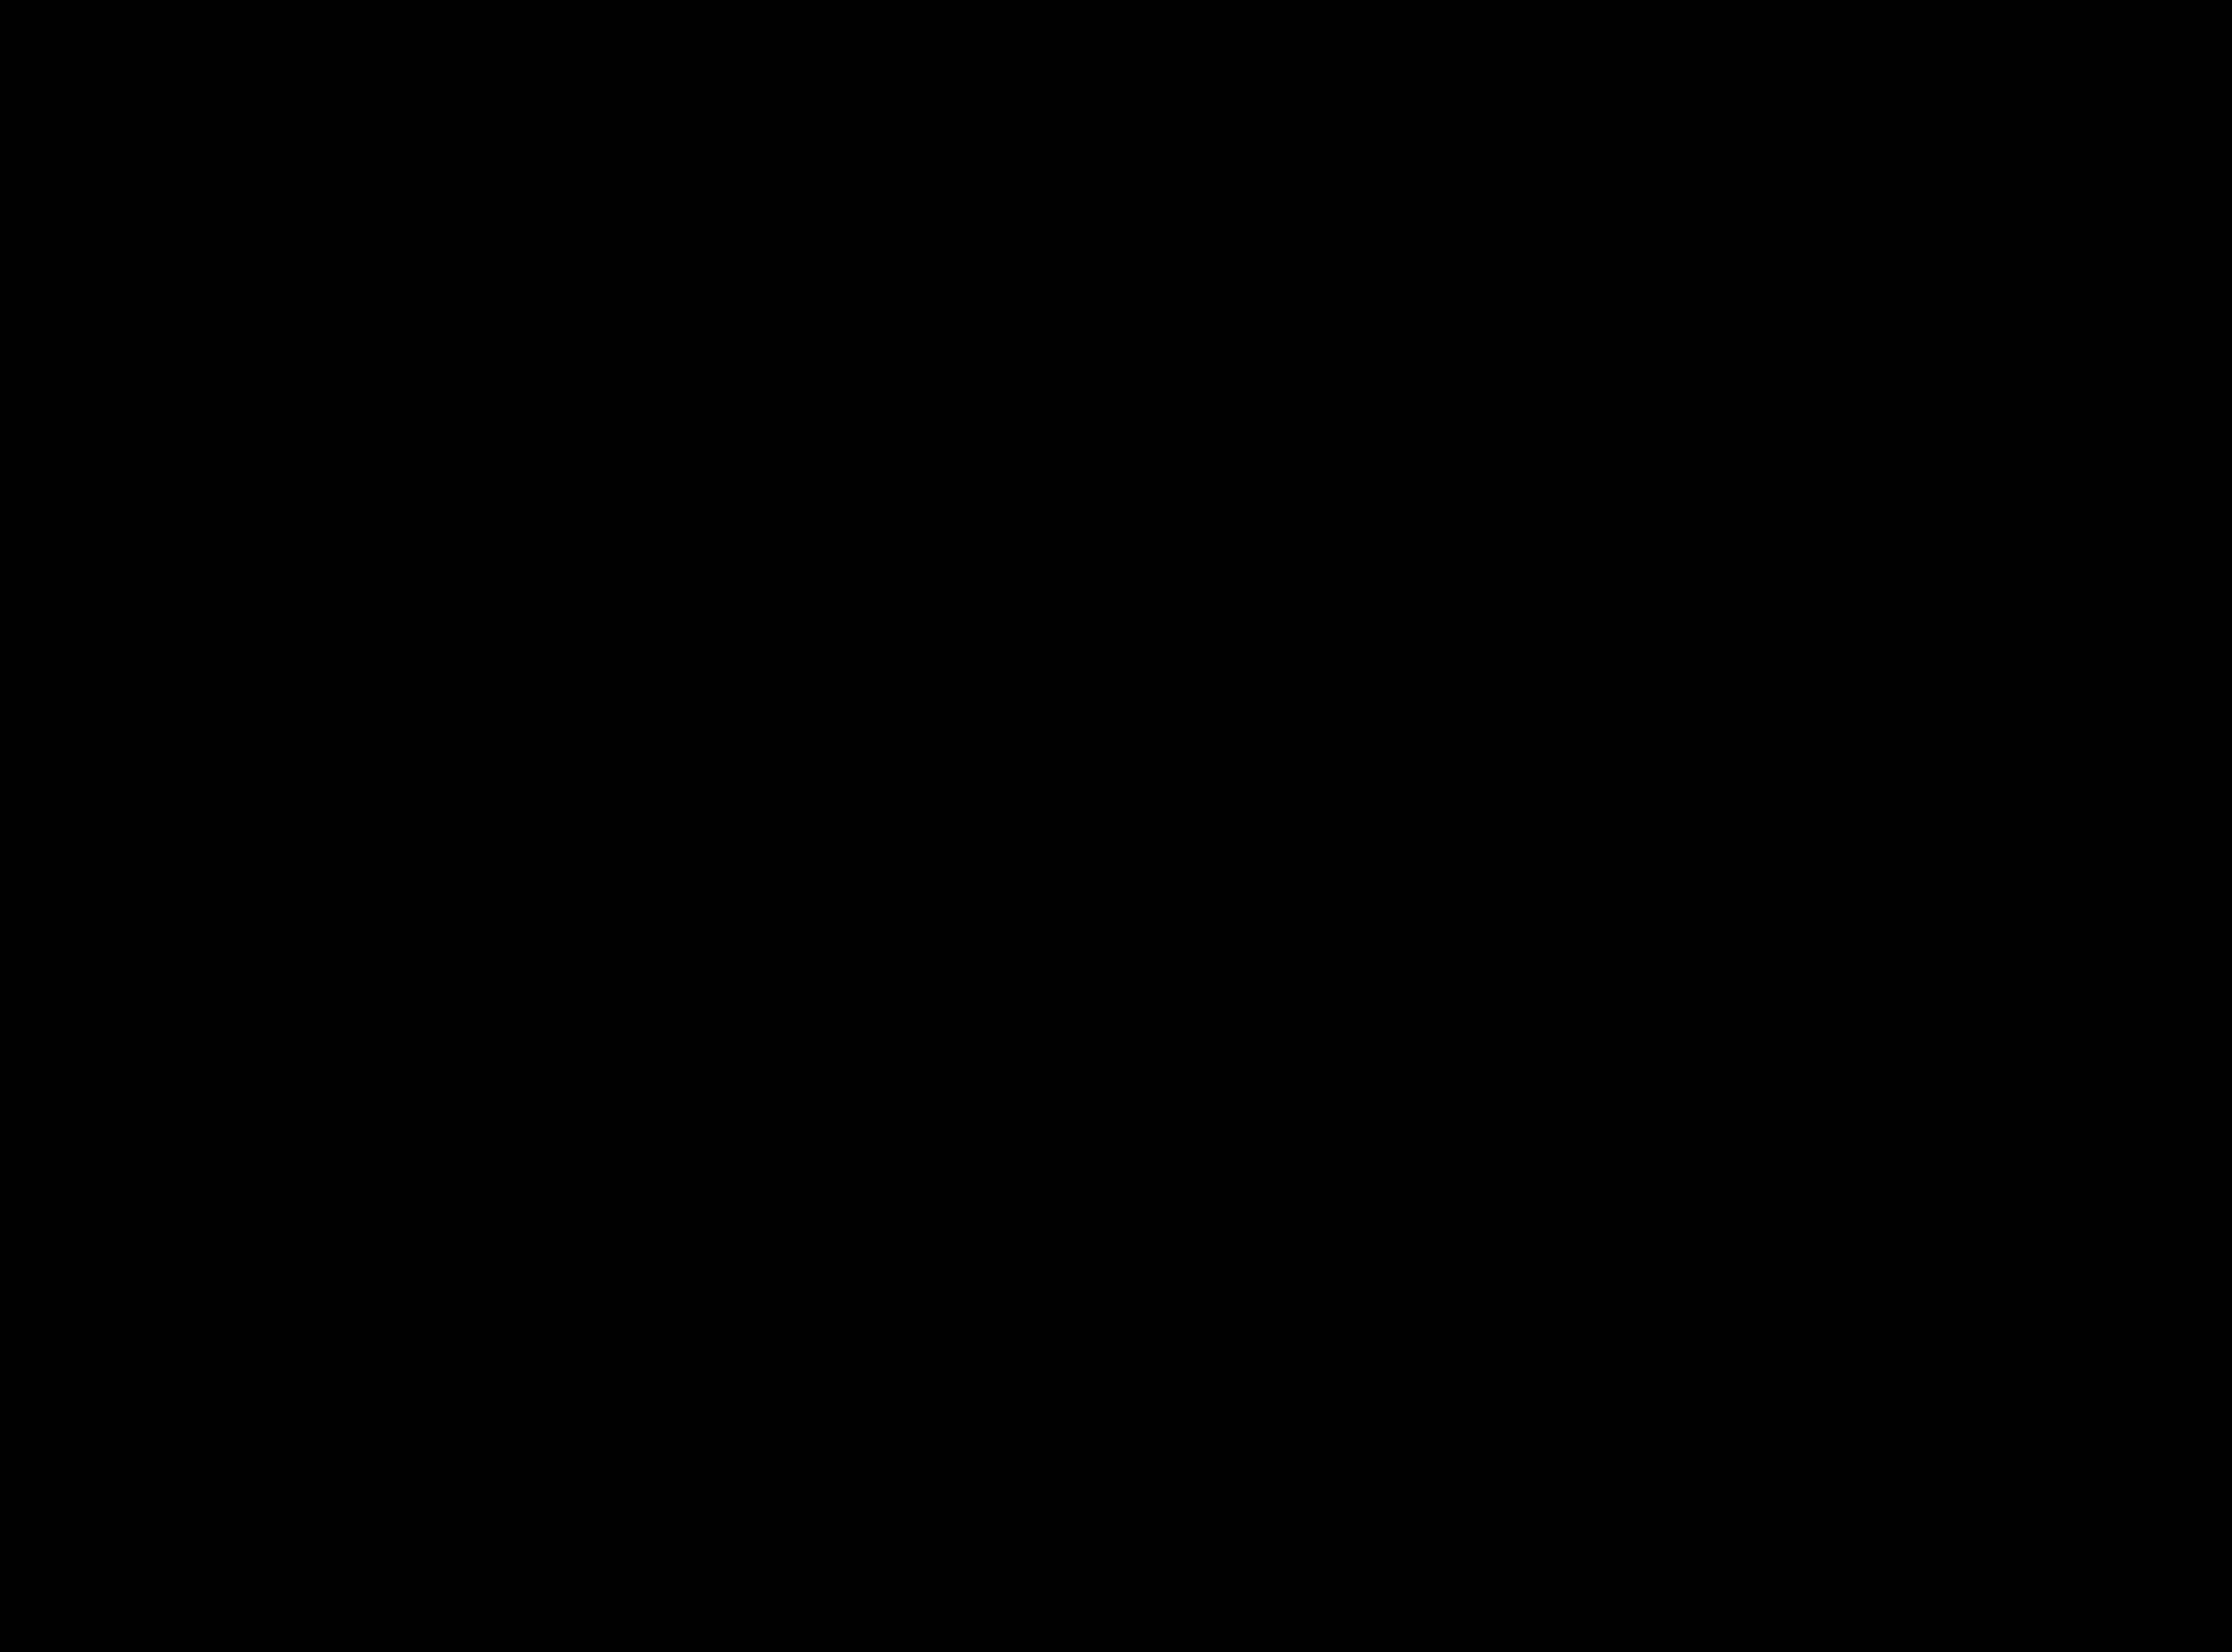 Fashion Ai Collection Perfume Cruise Logo Chanel Clipart.